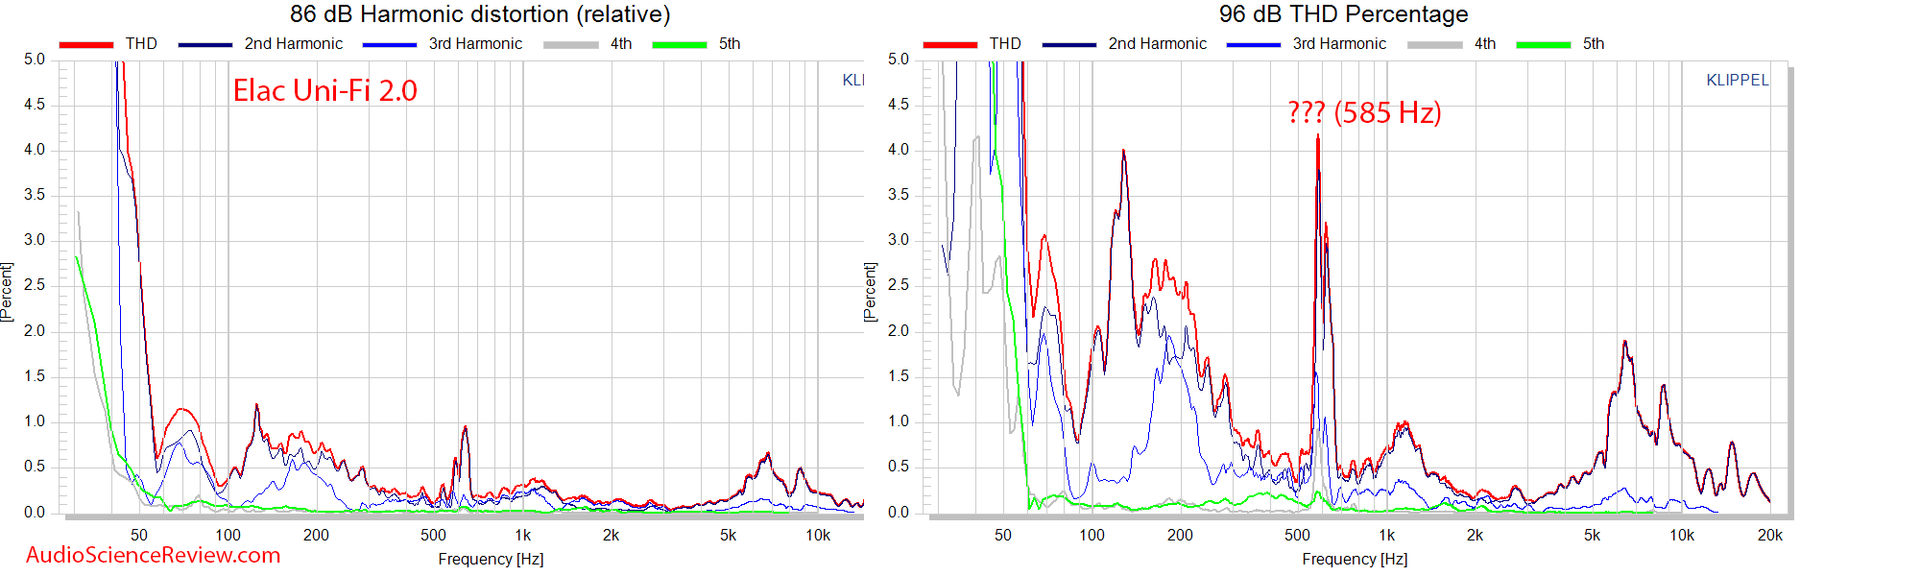 Elac Uni-Fi 2.0 Measurements Distortion.png